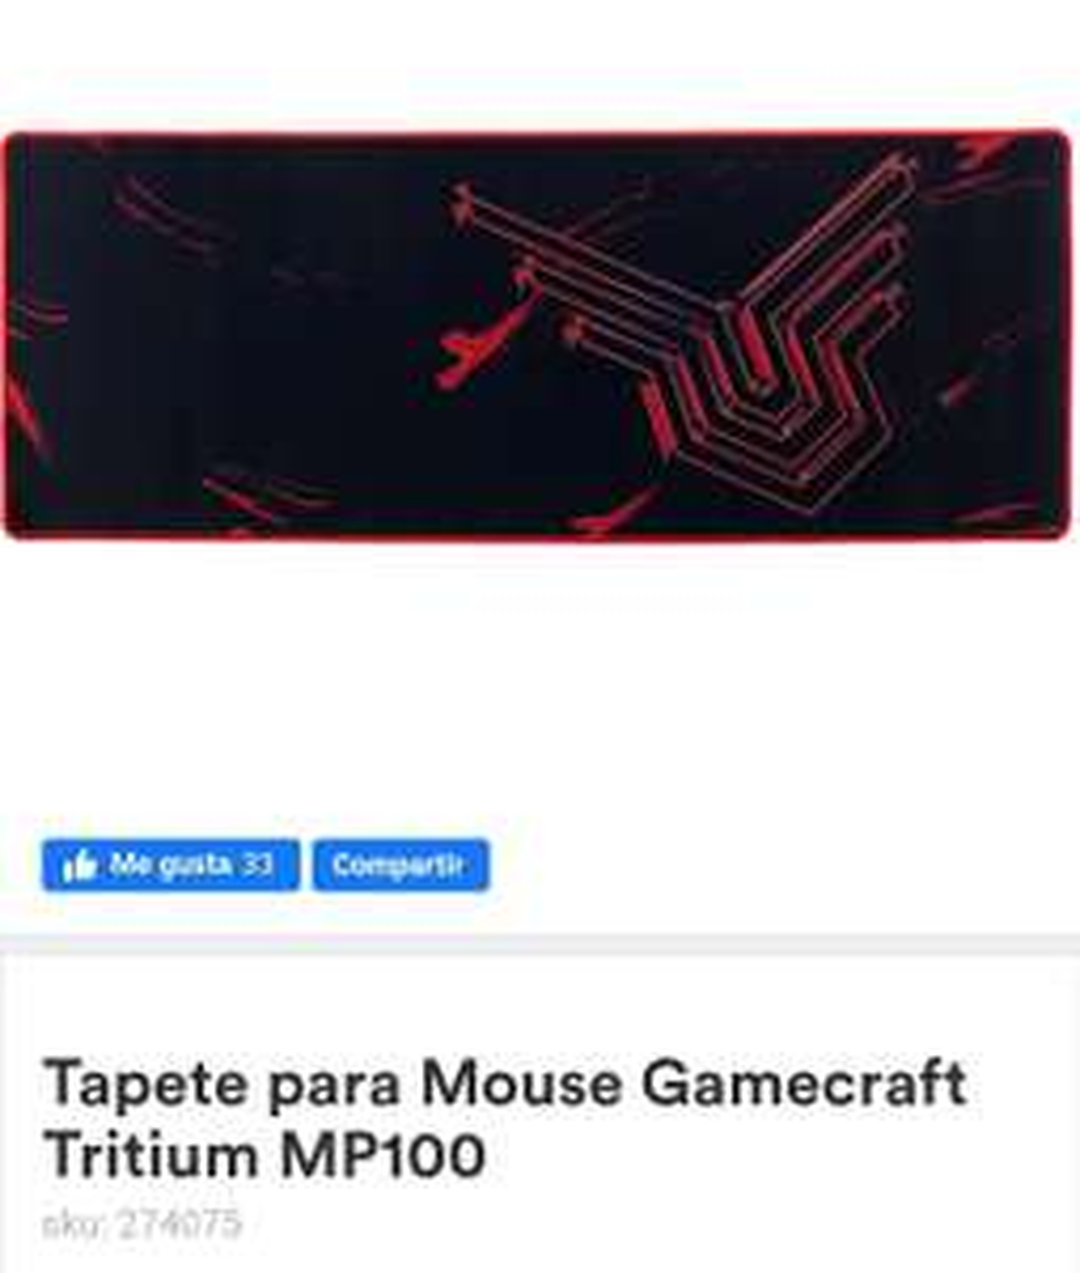 Coppel: Buen Mouse pad, a un buen precio. 30X80 CM